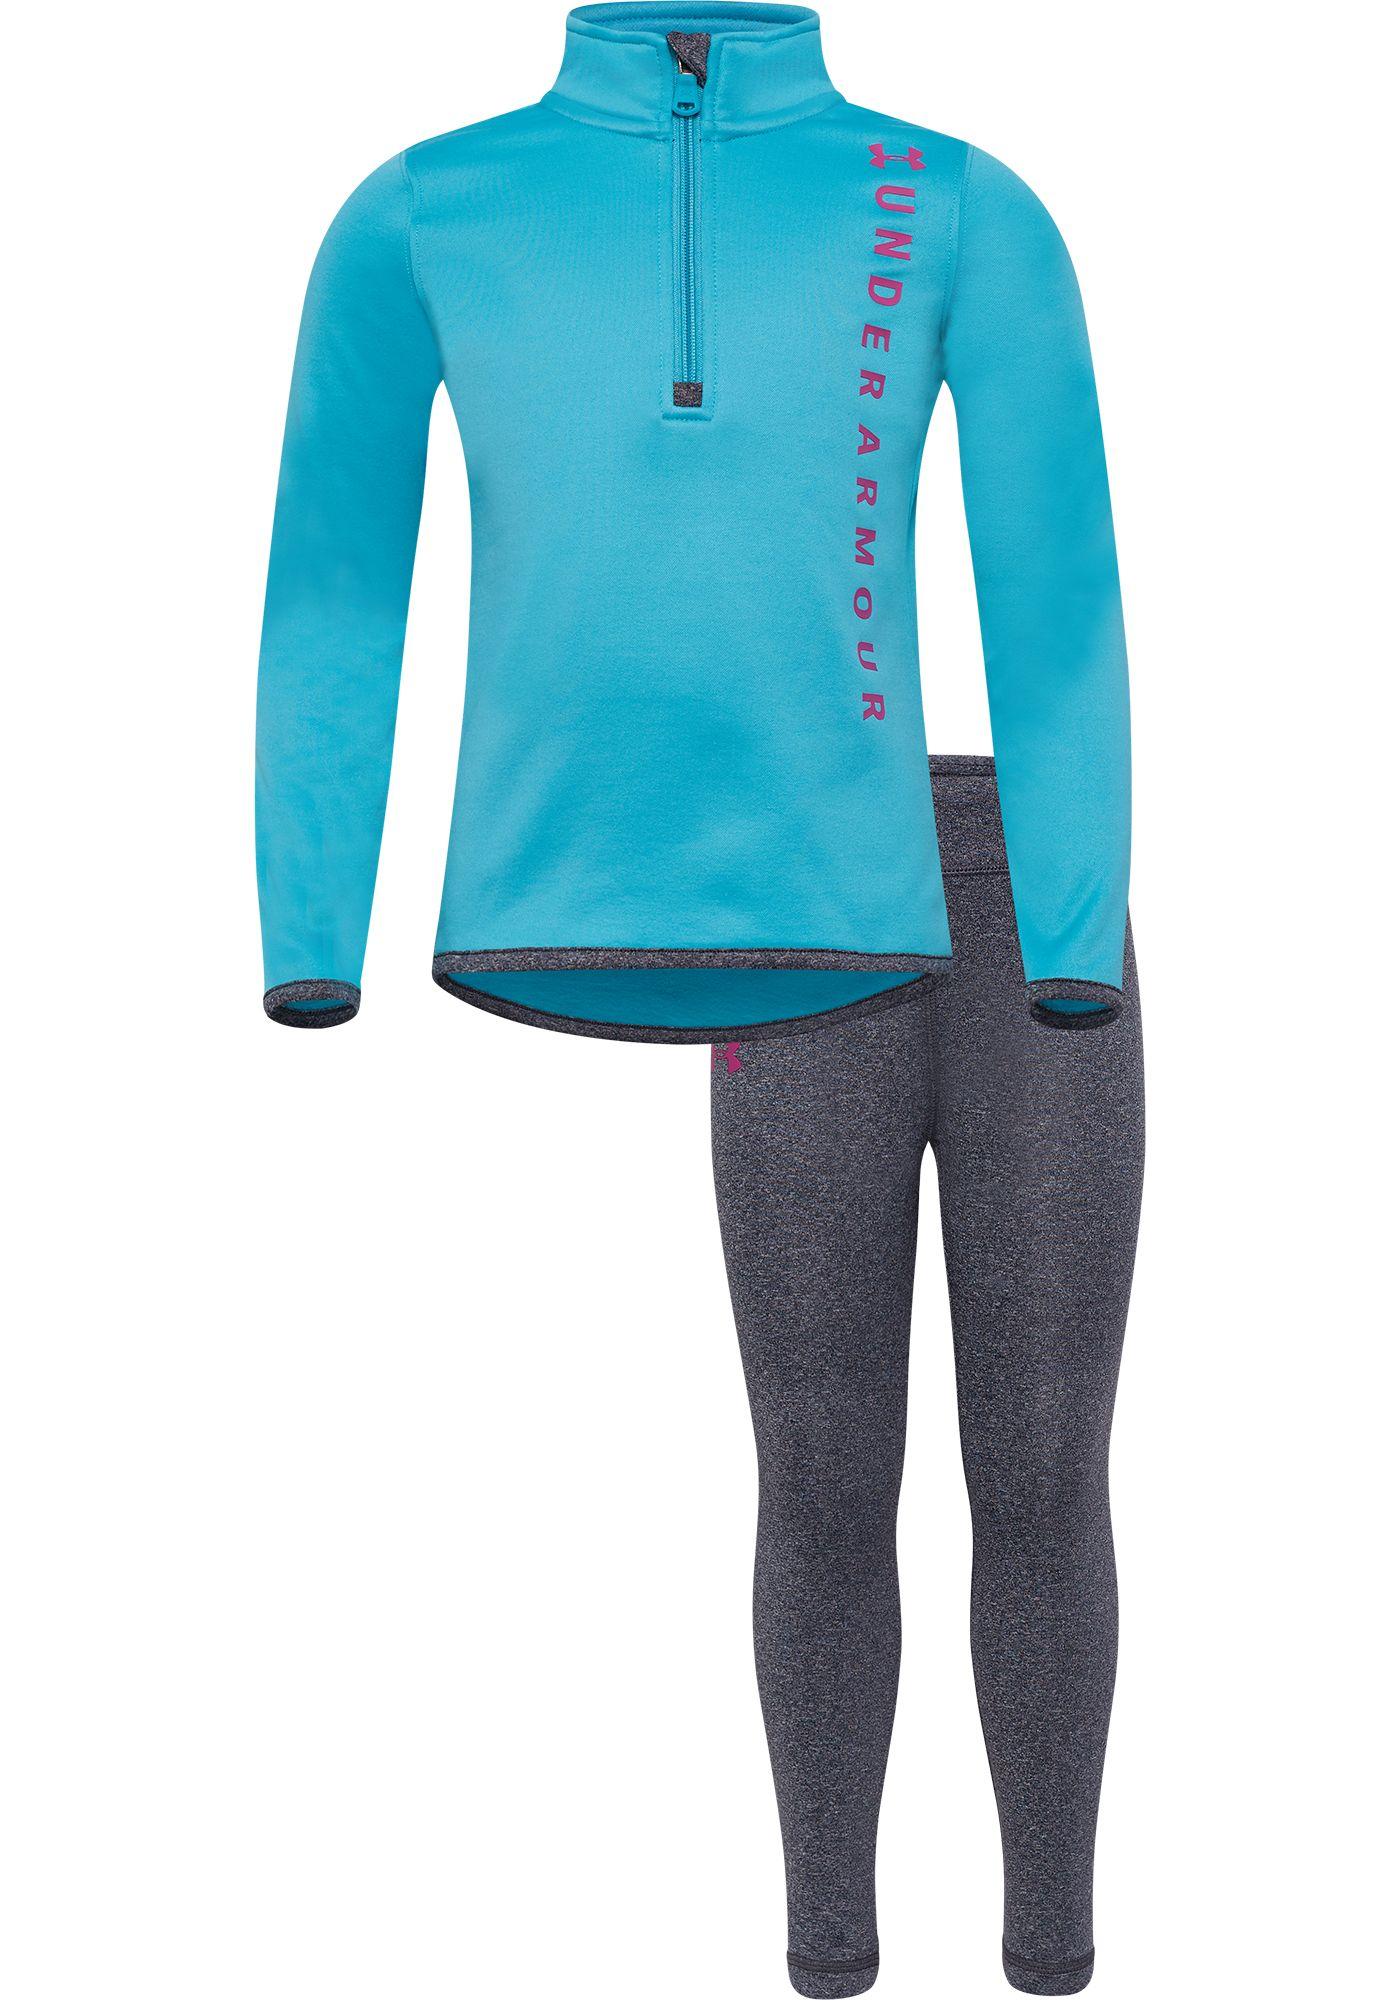 Under Armour Little Girls' Vertical Wordmark 1/4 Zip Long Sleeve Shirt and Leggings Set